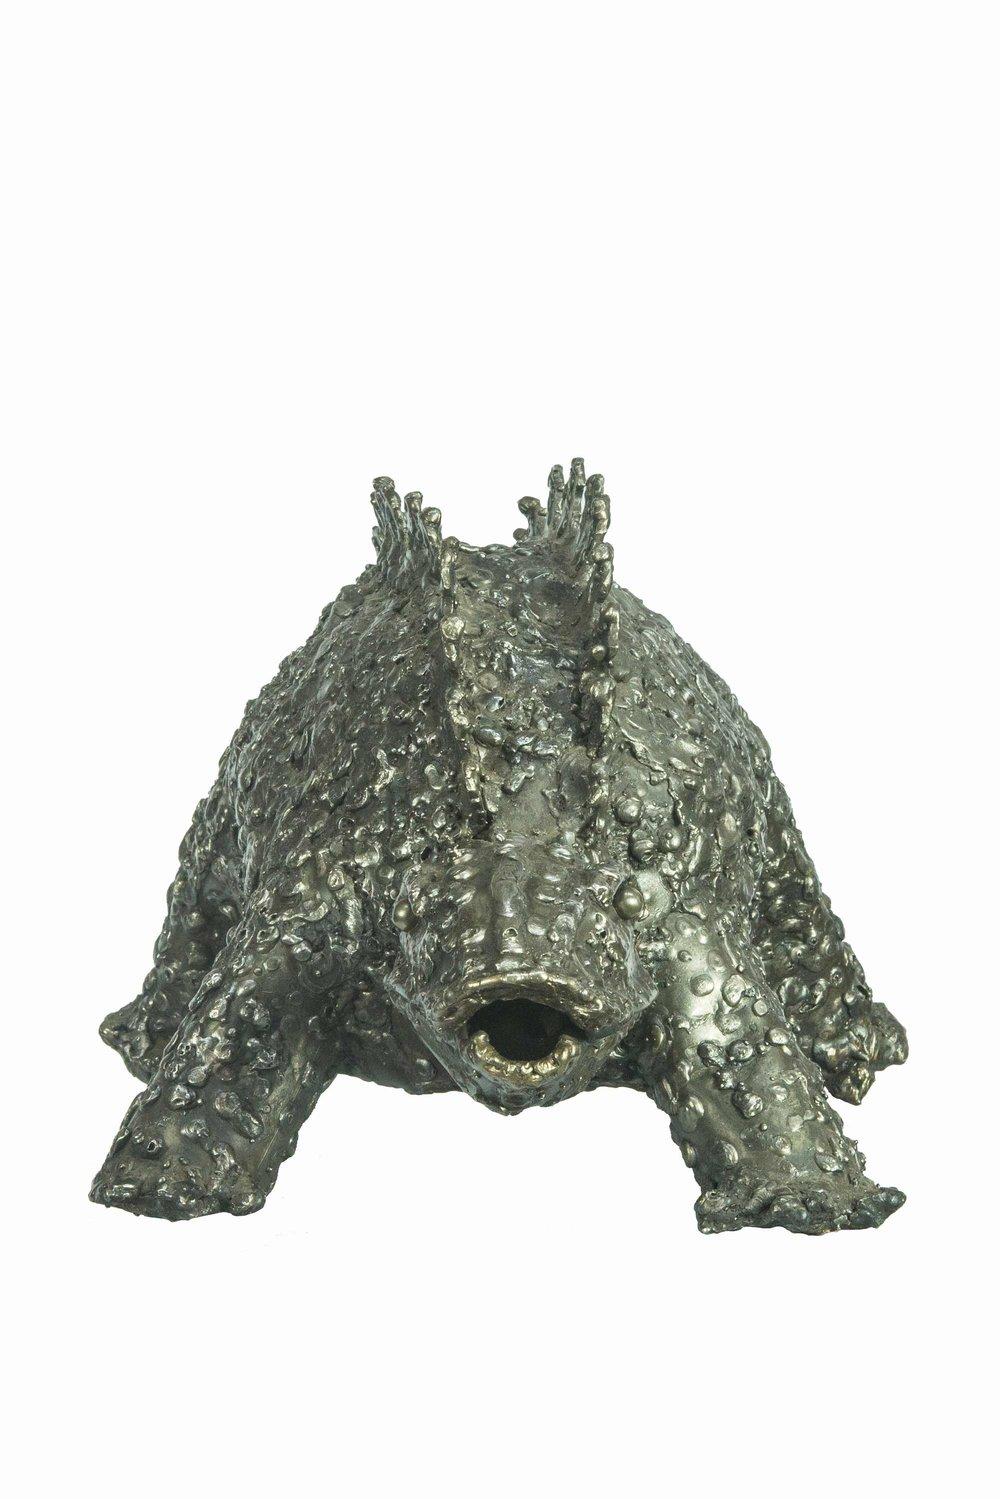 Stegosaurus-2_183.jpg